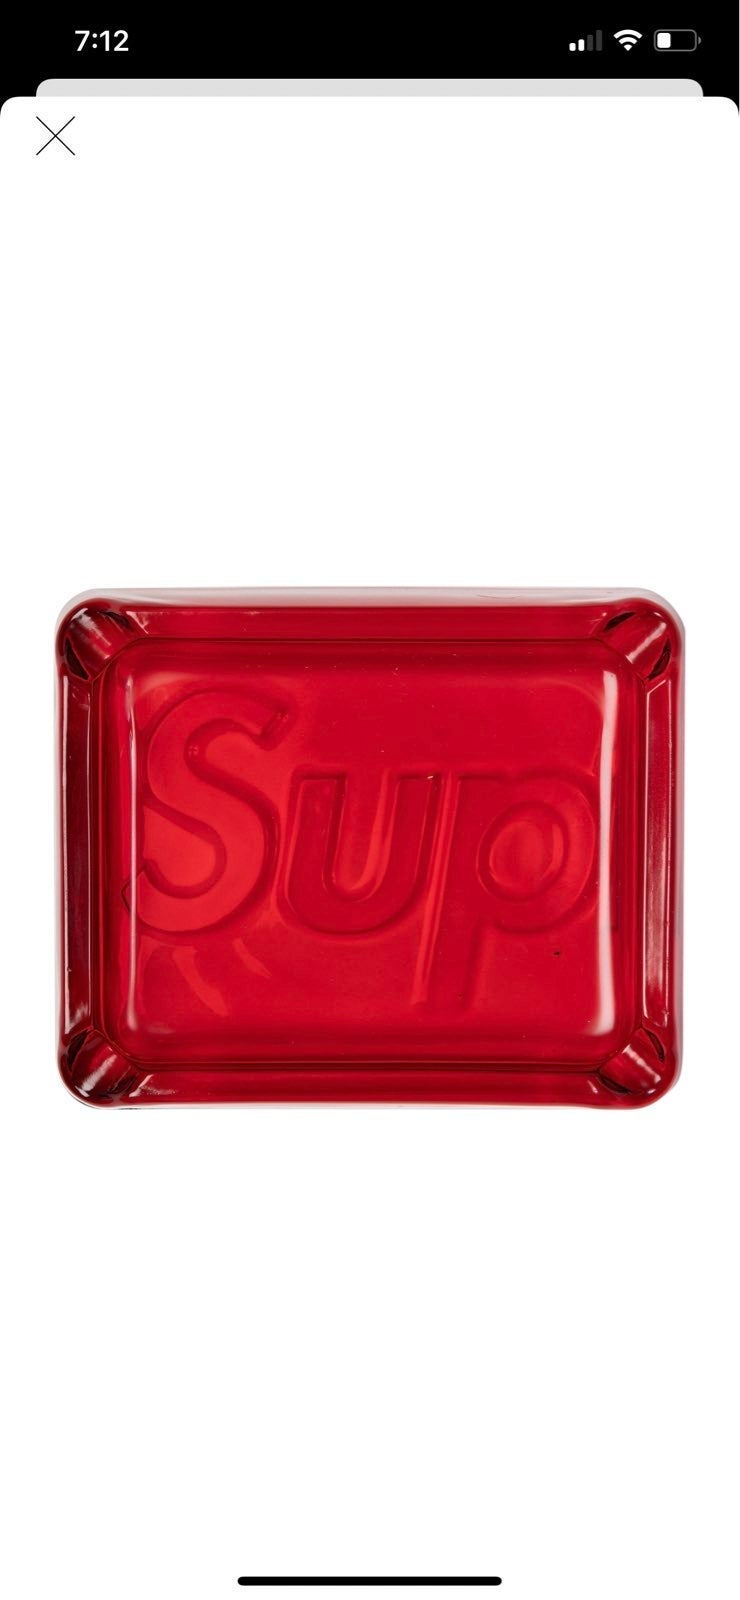 Supreme Ash Tray (New)